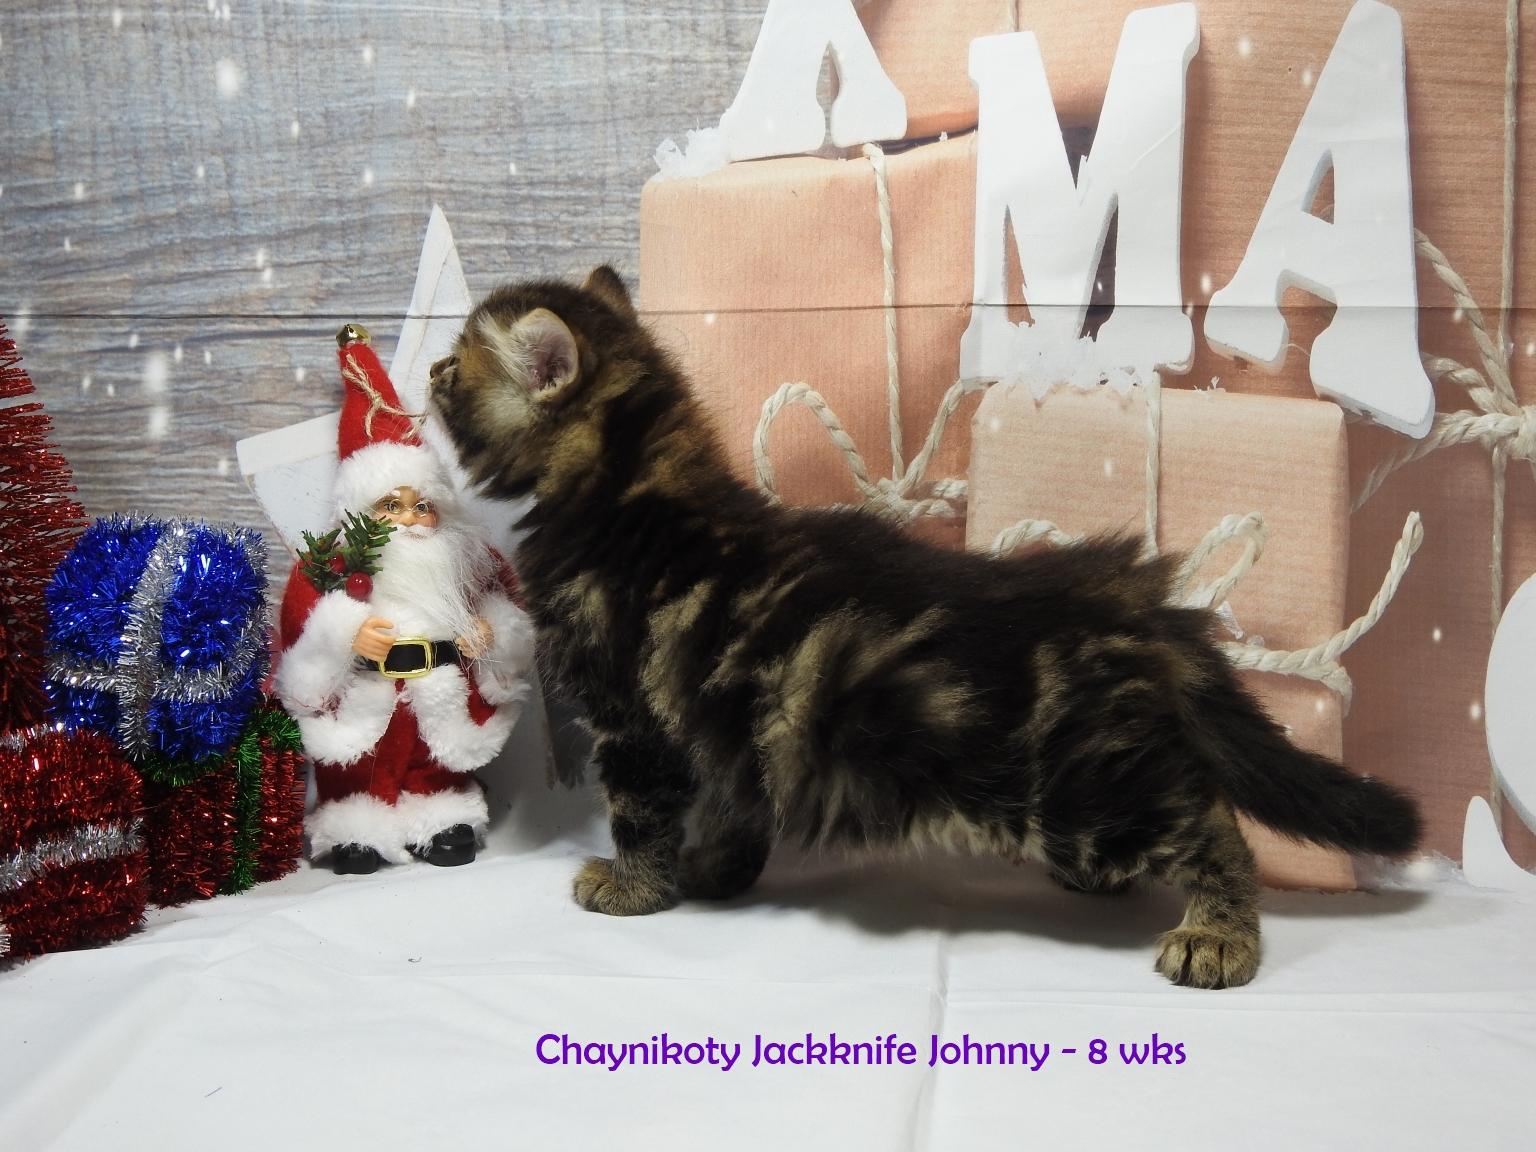 Chaynikot Jackknife Johnny - 8 wks12